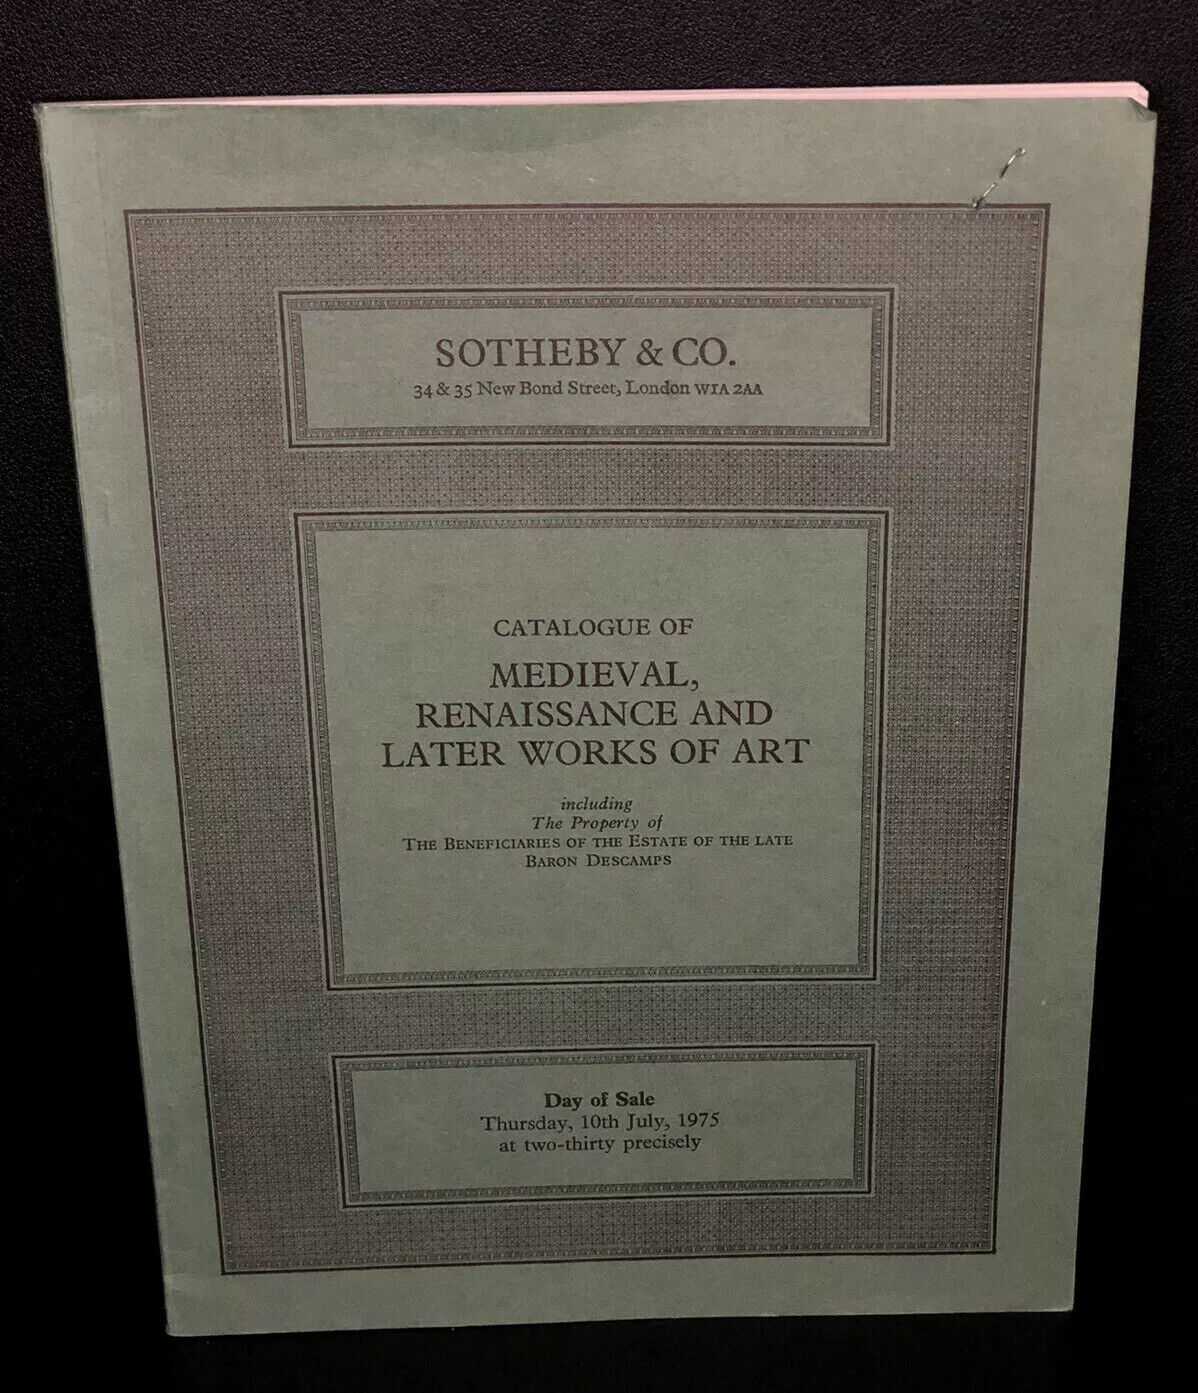 Vintage 1975 Sothebys Auction Catalog Medieval Renaissance and Works of Art